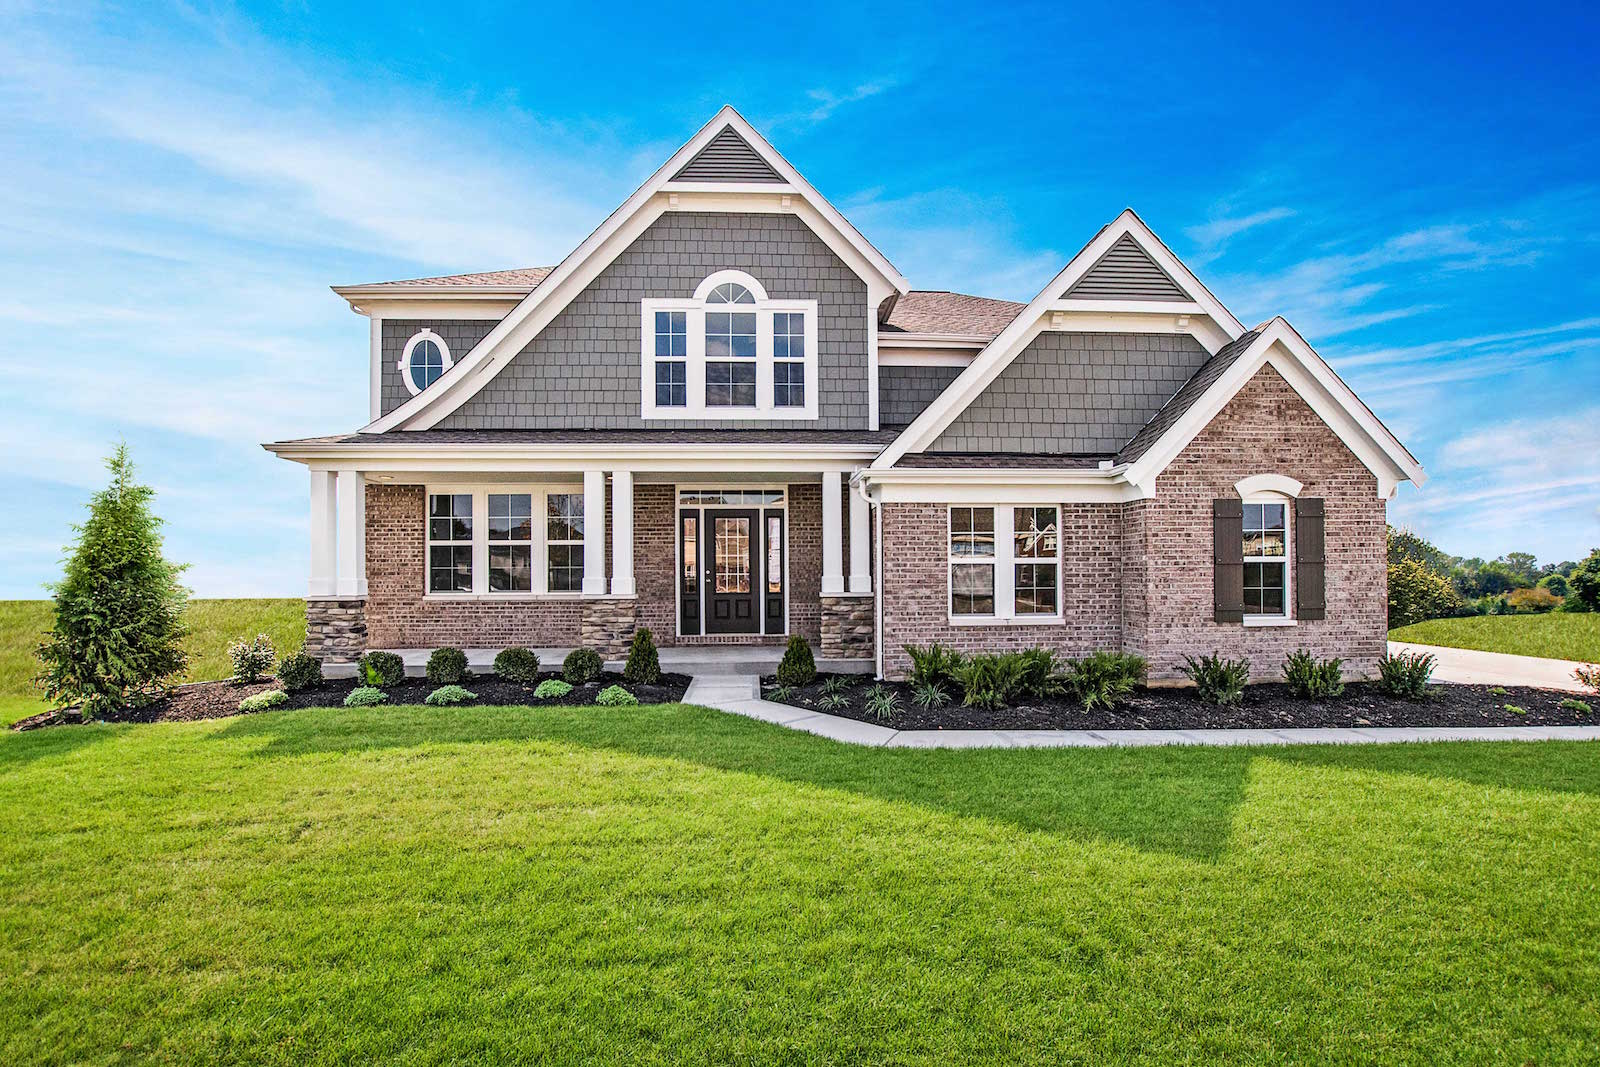 Fischer Homes Plans New Cincinnati Area Community Builder Magazine